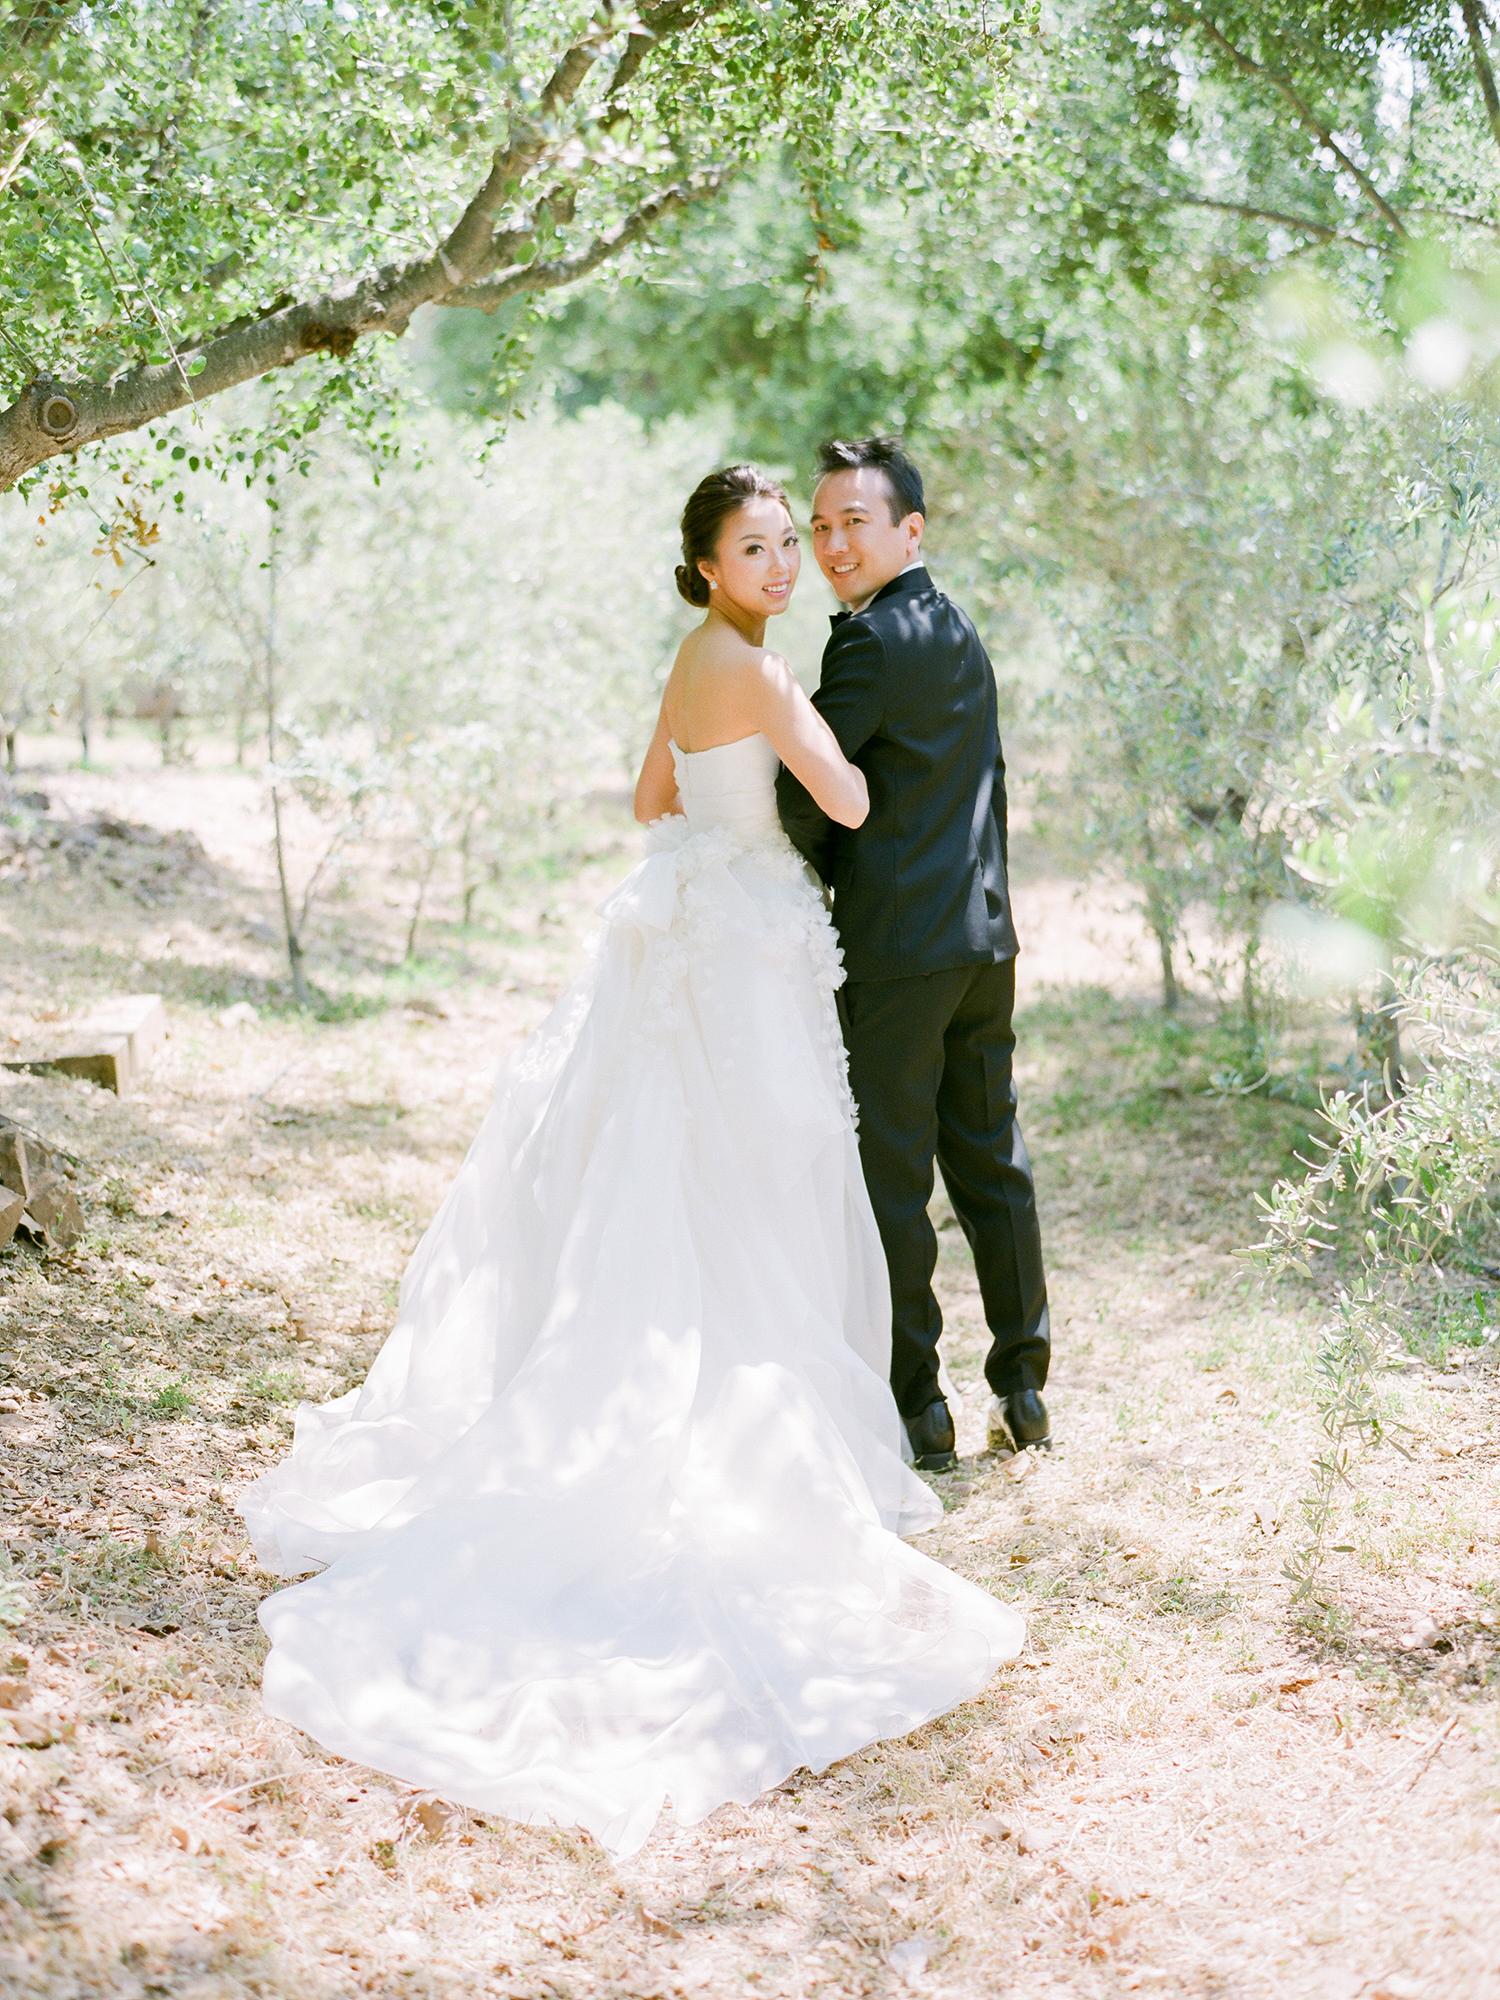 grace ceron wedding couple looking over shoulders